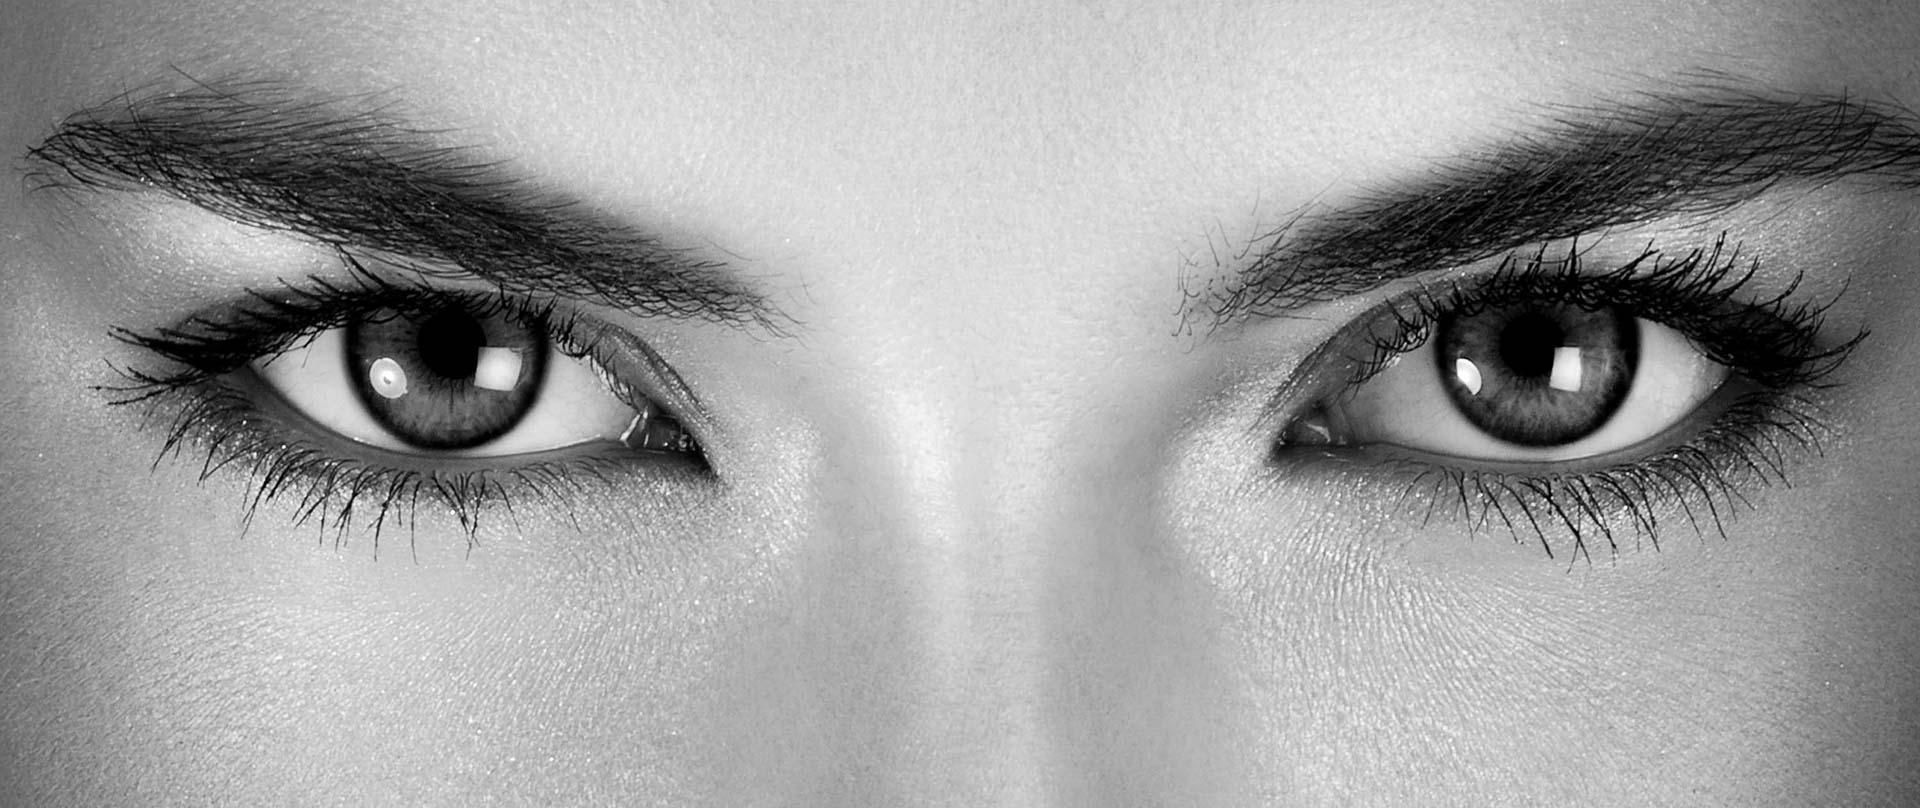 Facial Cosmetic Surgery | Guyette Facial & Oral Surgery Testimonials | Scottsdale, AZ